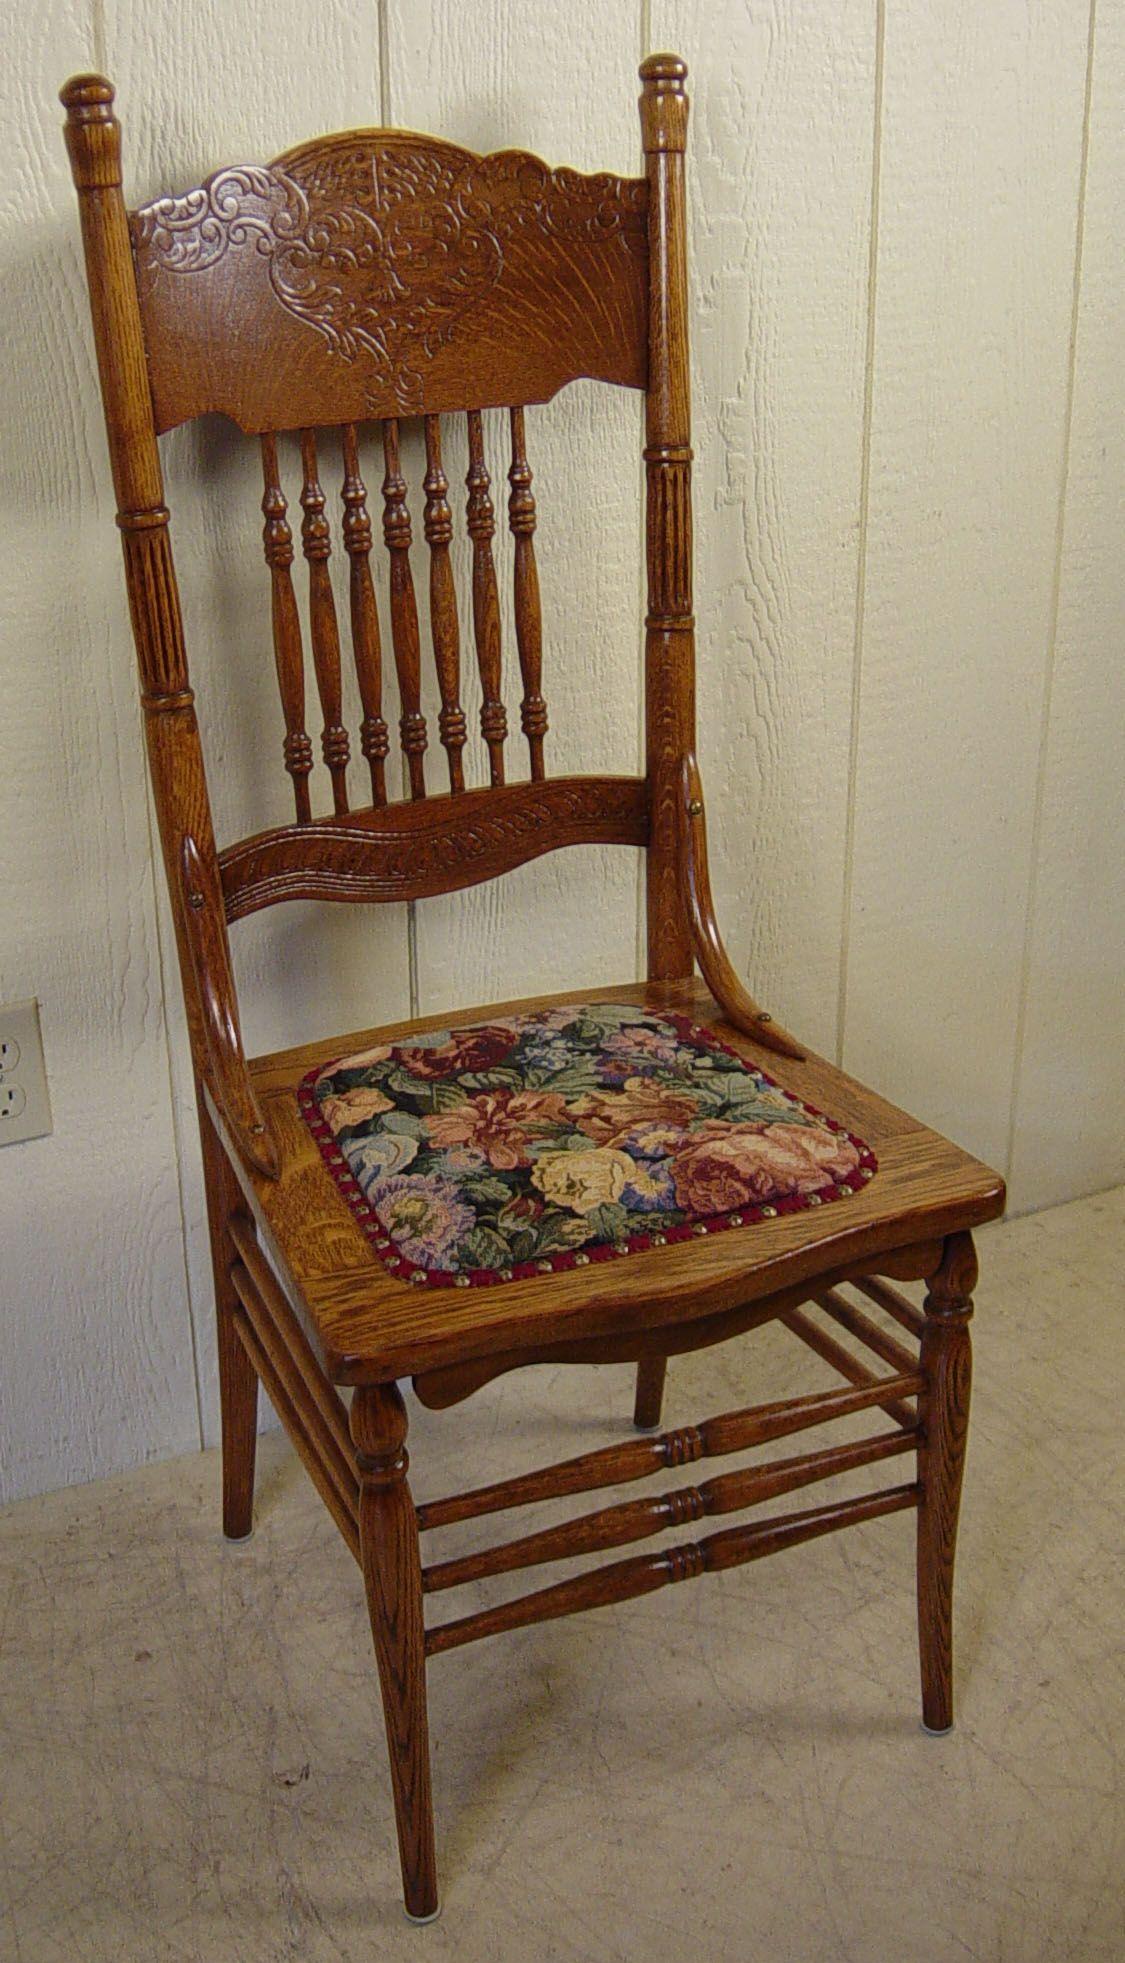 Set of 4 Oak Press back Chairs - Set Of 4 Oak Press Back Chairs Quartersawn Oak Wishlist